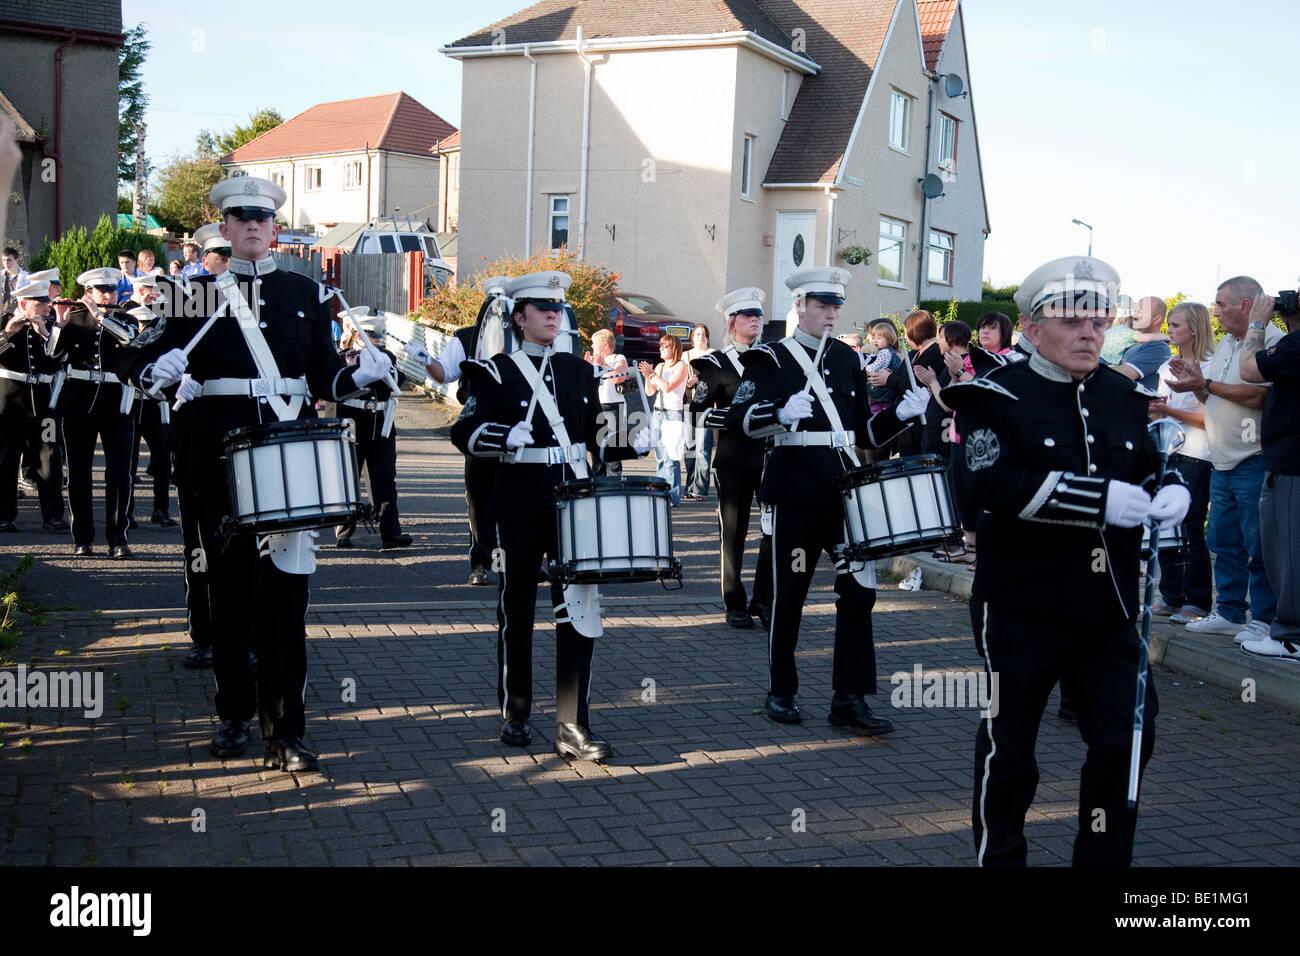 Cambuslang Volunteers Flute Band, a Loyalist/Orange Marching Band on parade in Kilwinning, Ayrshire, Scotland - Stock Image